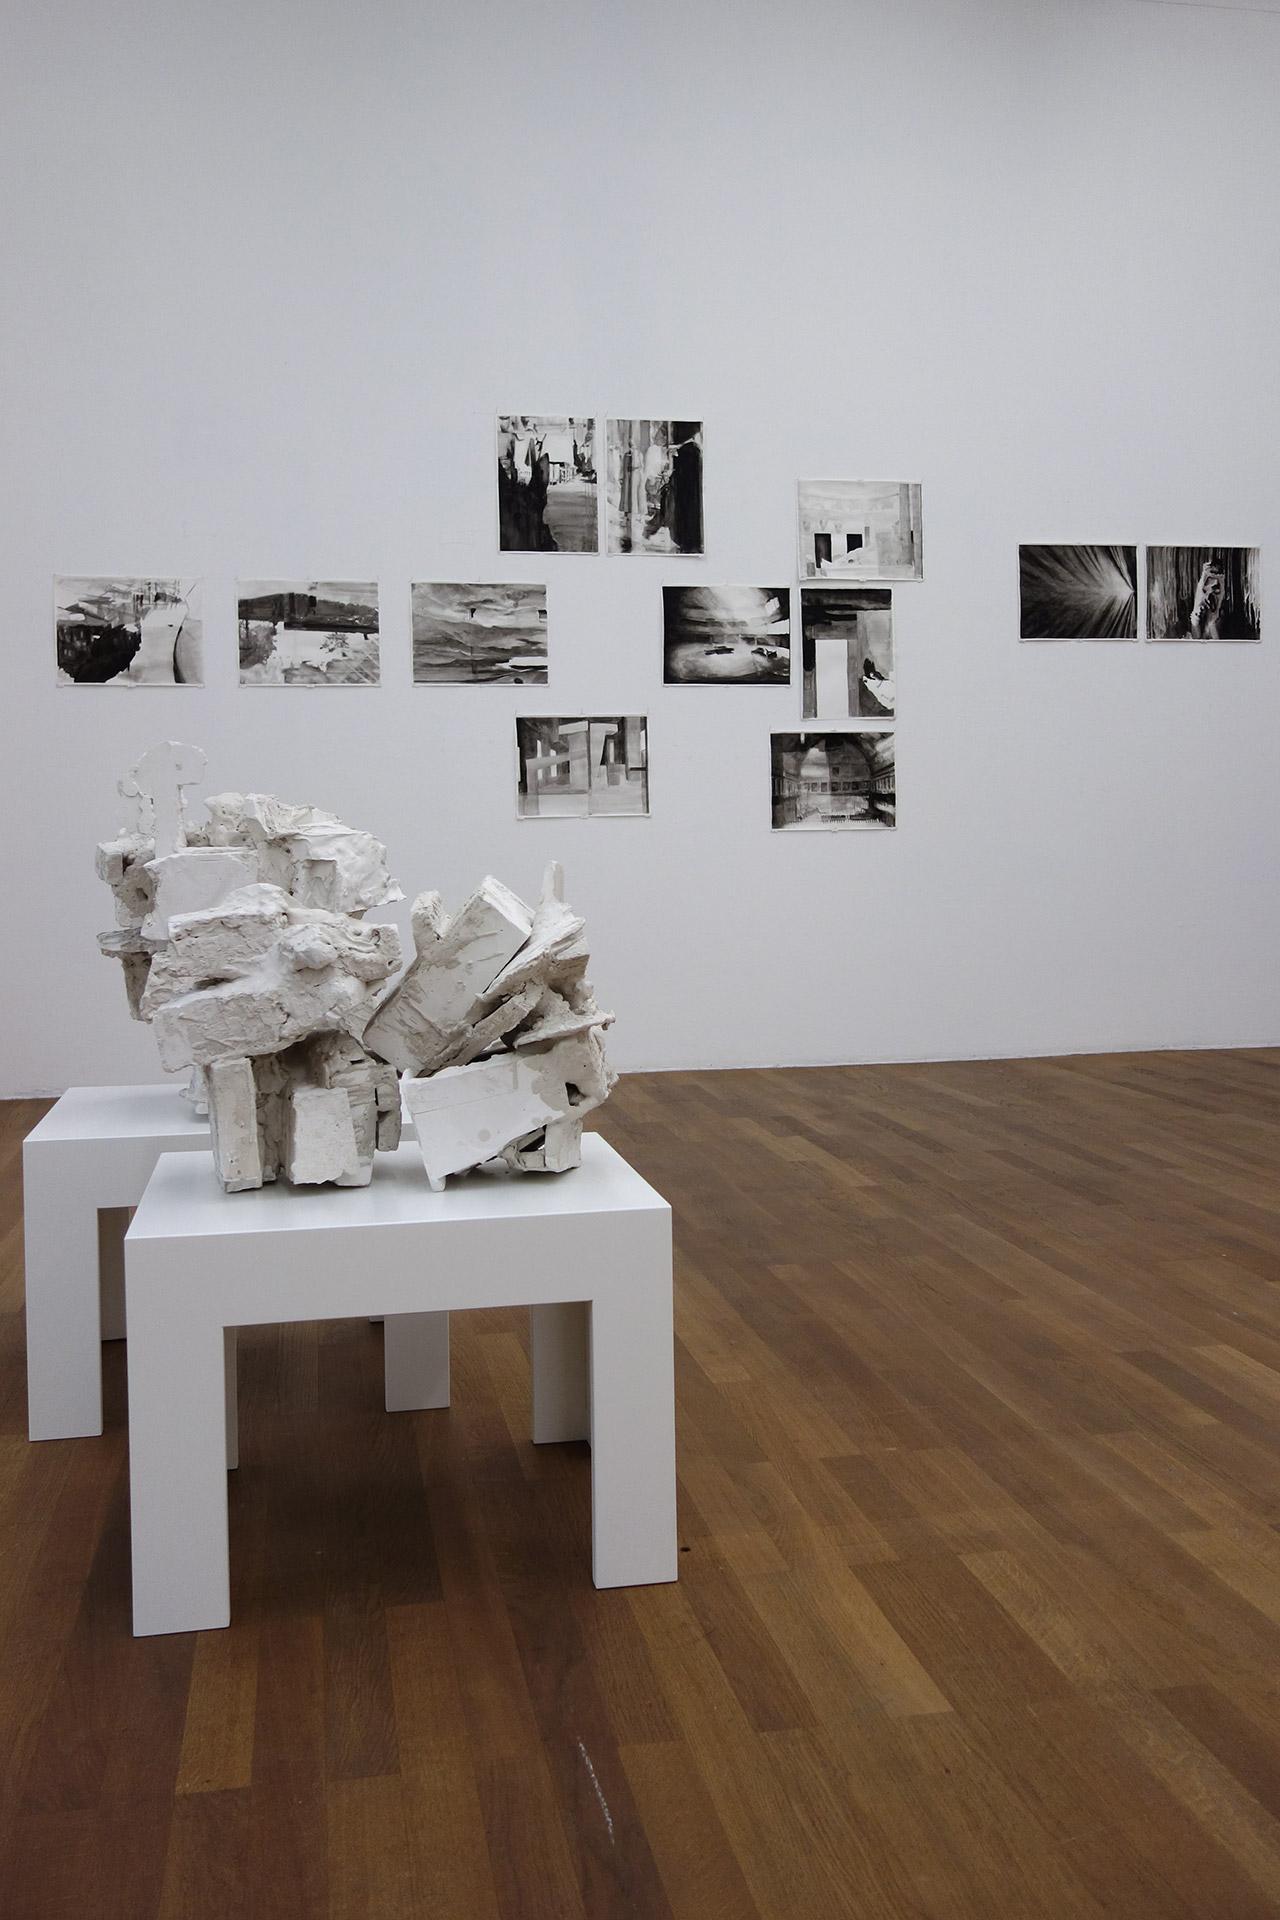 Kunsthalle-Winterthur-Dezember-Ausstellung-2017-4.jpg